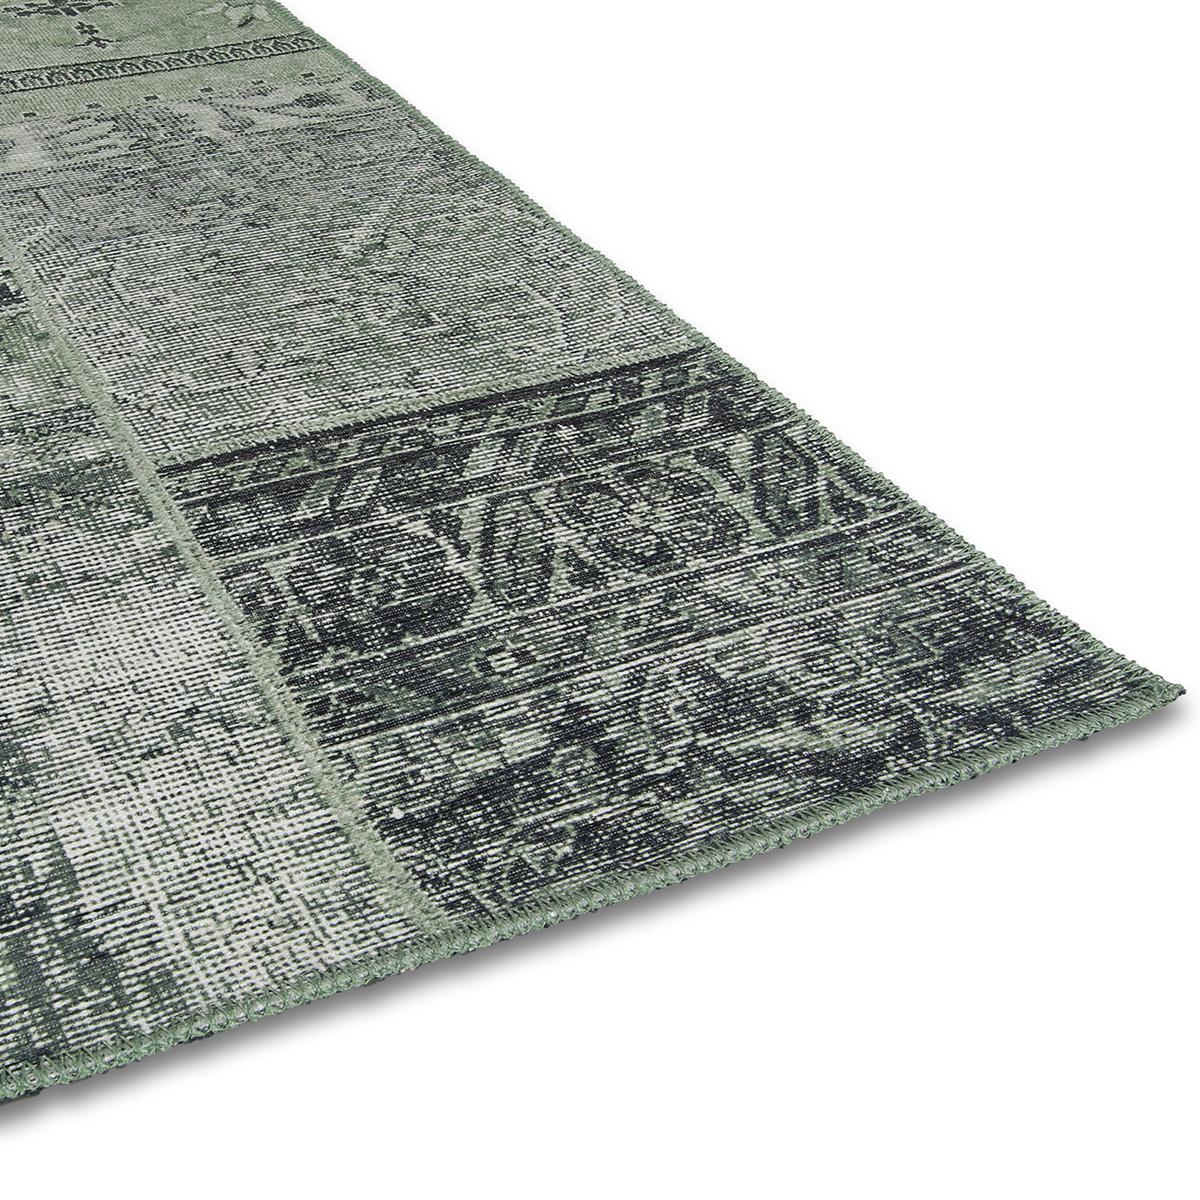 Vloerkleed Brinker Bukan Dark Green | 160 x 230 cm